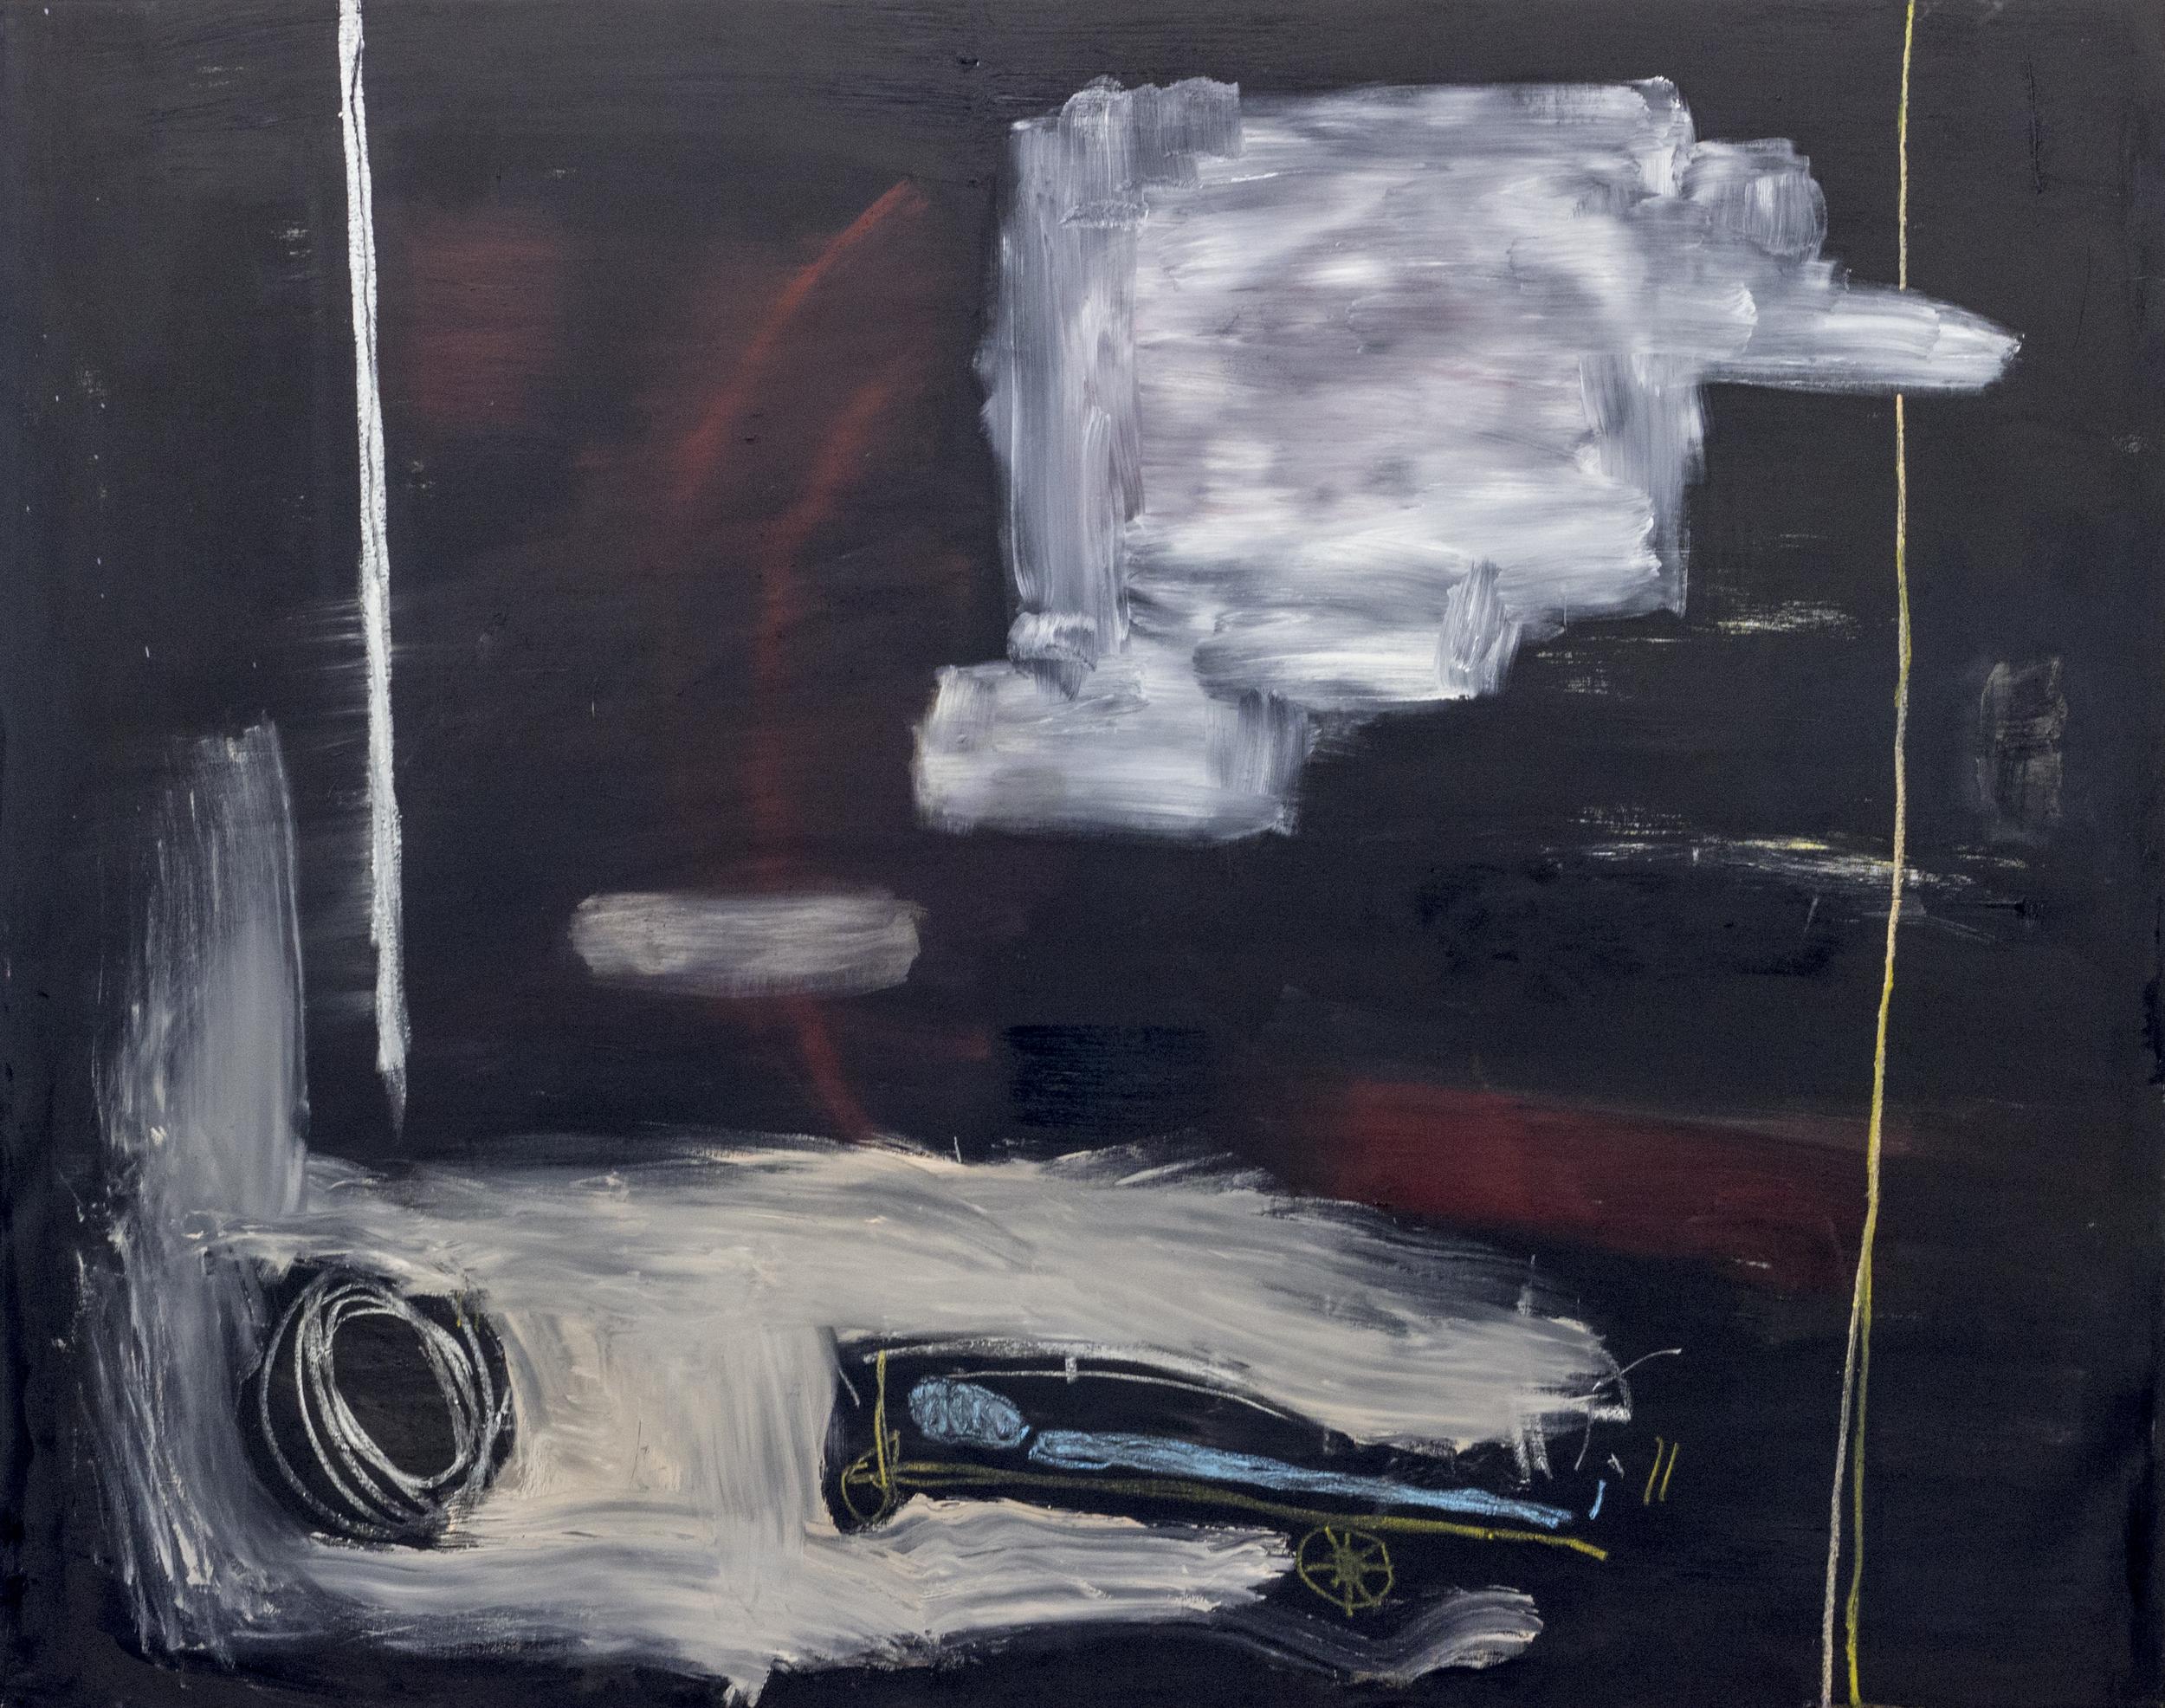 Phantasmagoria , 2015  54 x 68 Inches  Oil, Chalk Pastel, Graphite, and Oil Stick on Canvas